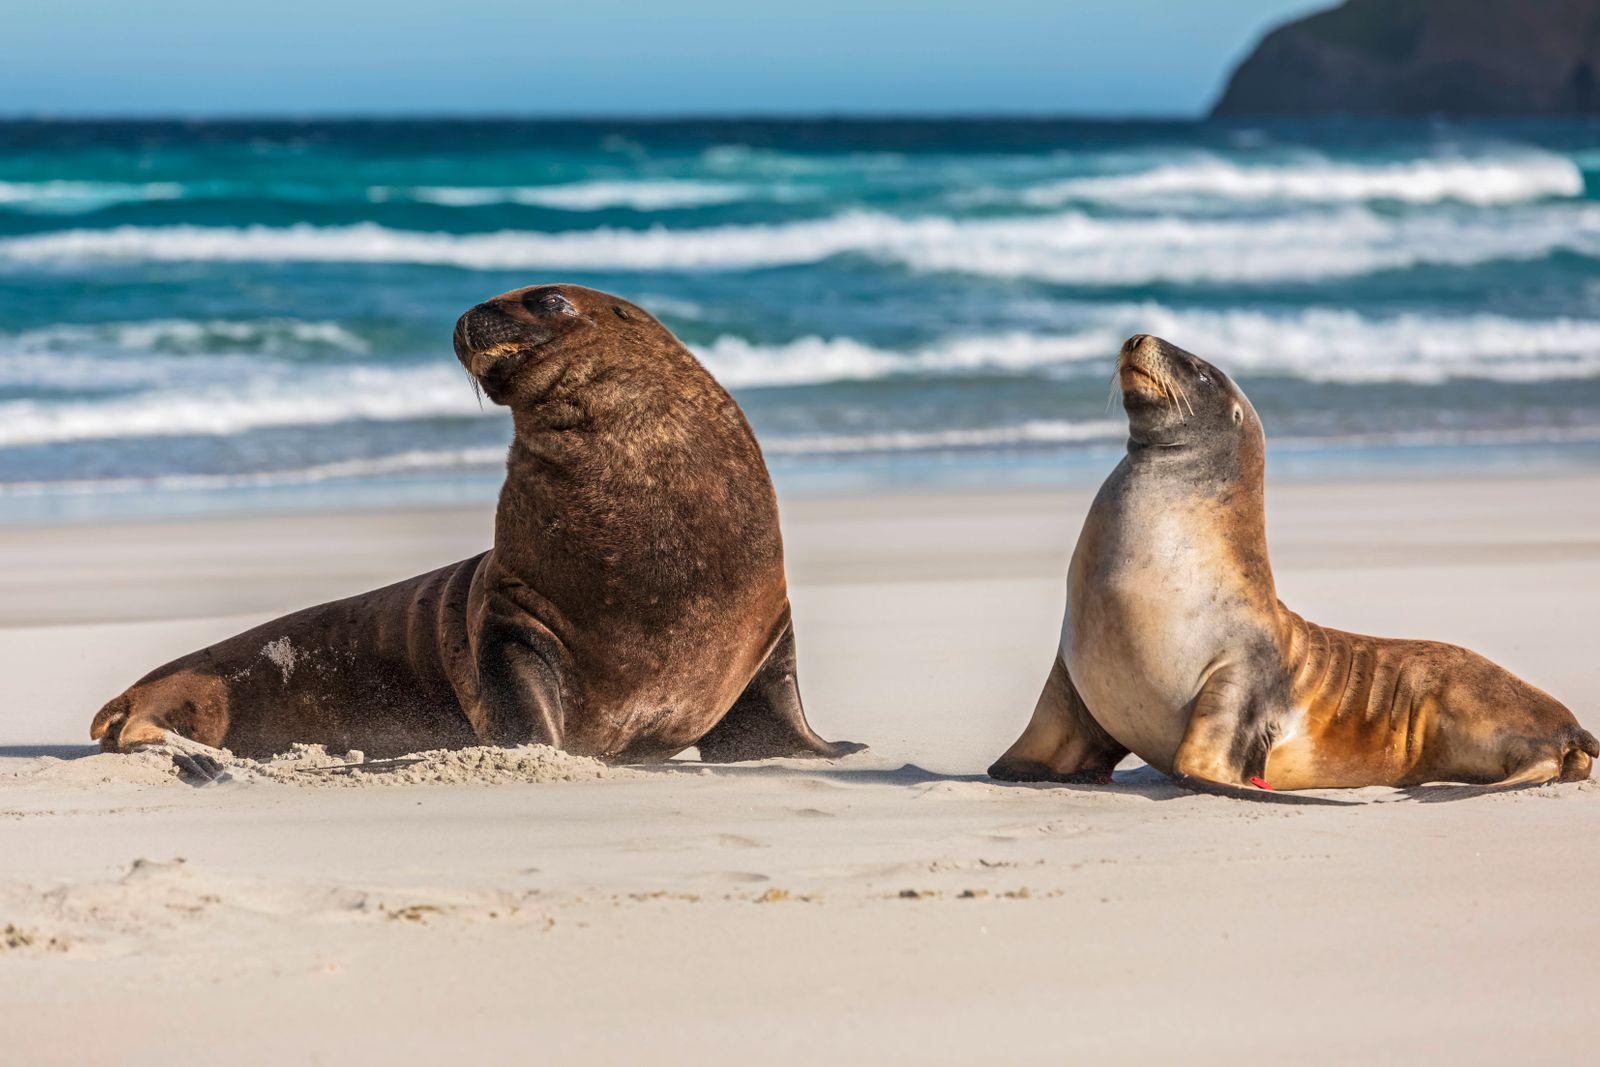 New Zealand, Dunedin, New Zealand sea lions (Phocarctos hookeri) mating on Allans Beach PUBLICATIONxINxGERxSUIxAUTxHUNxO